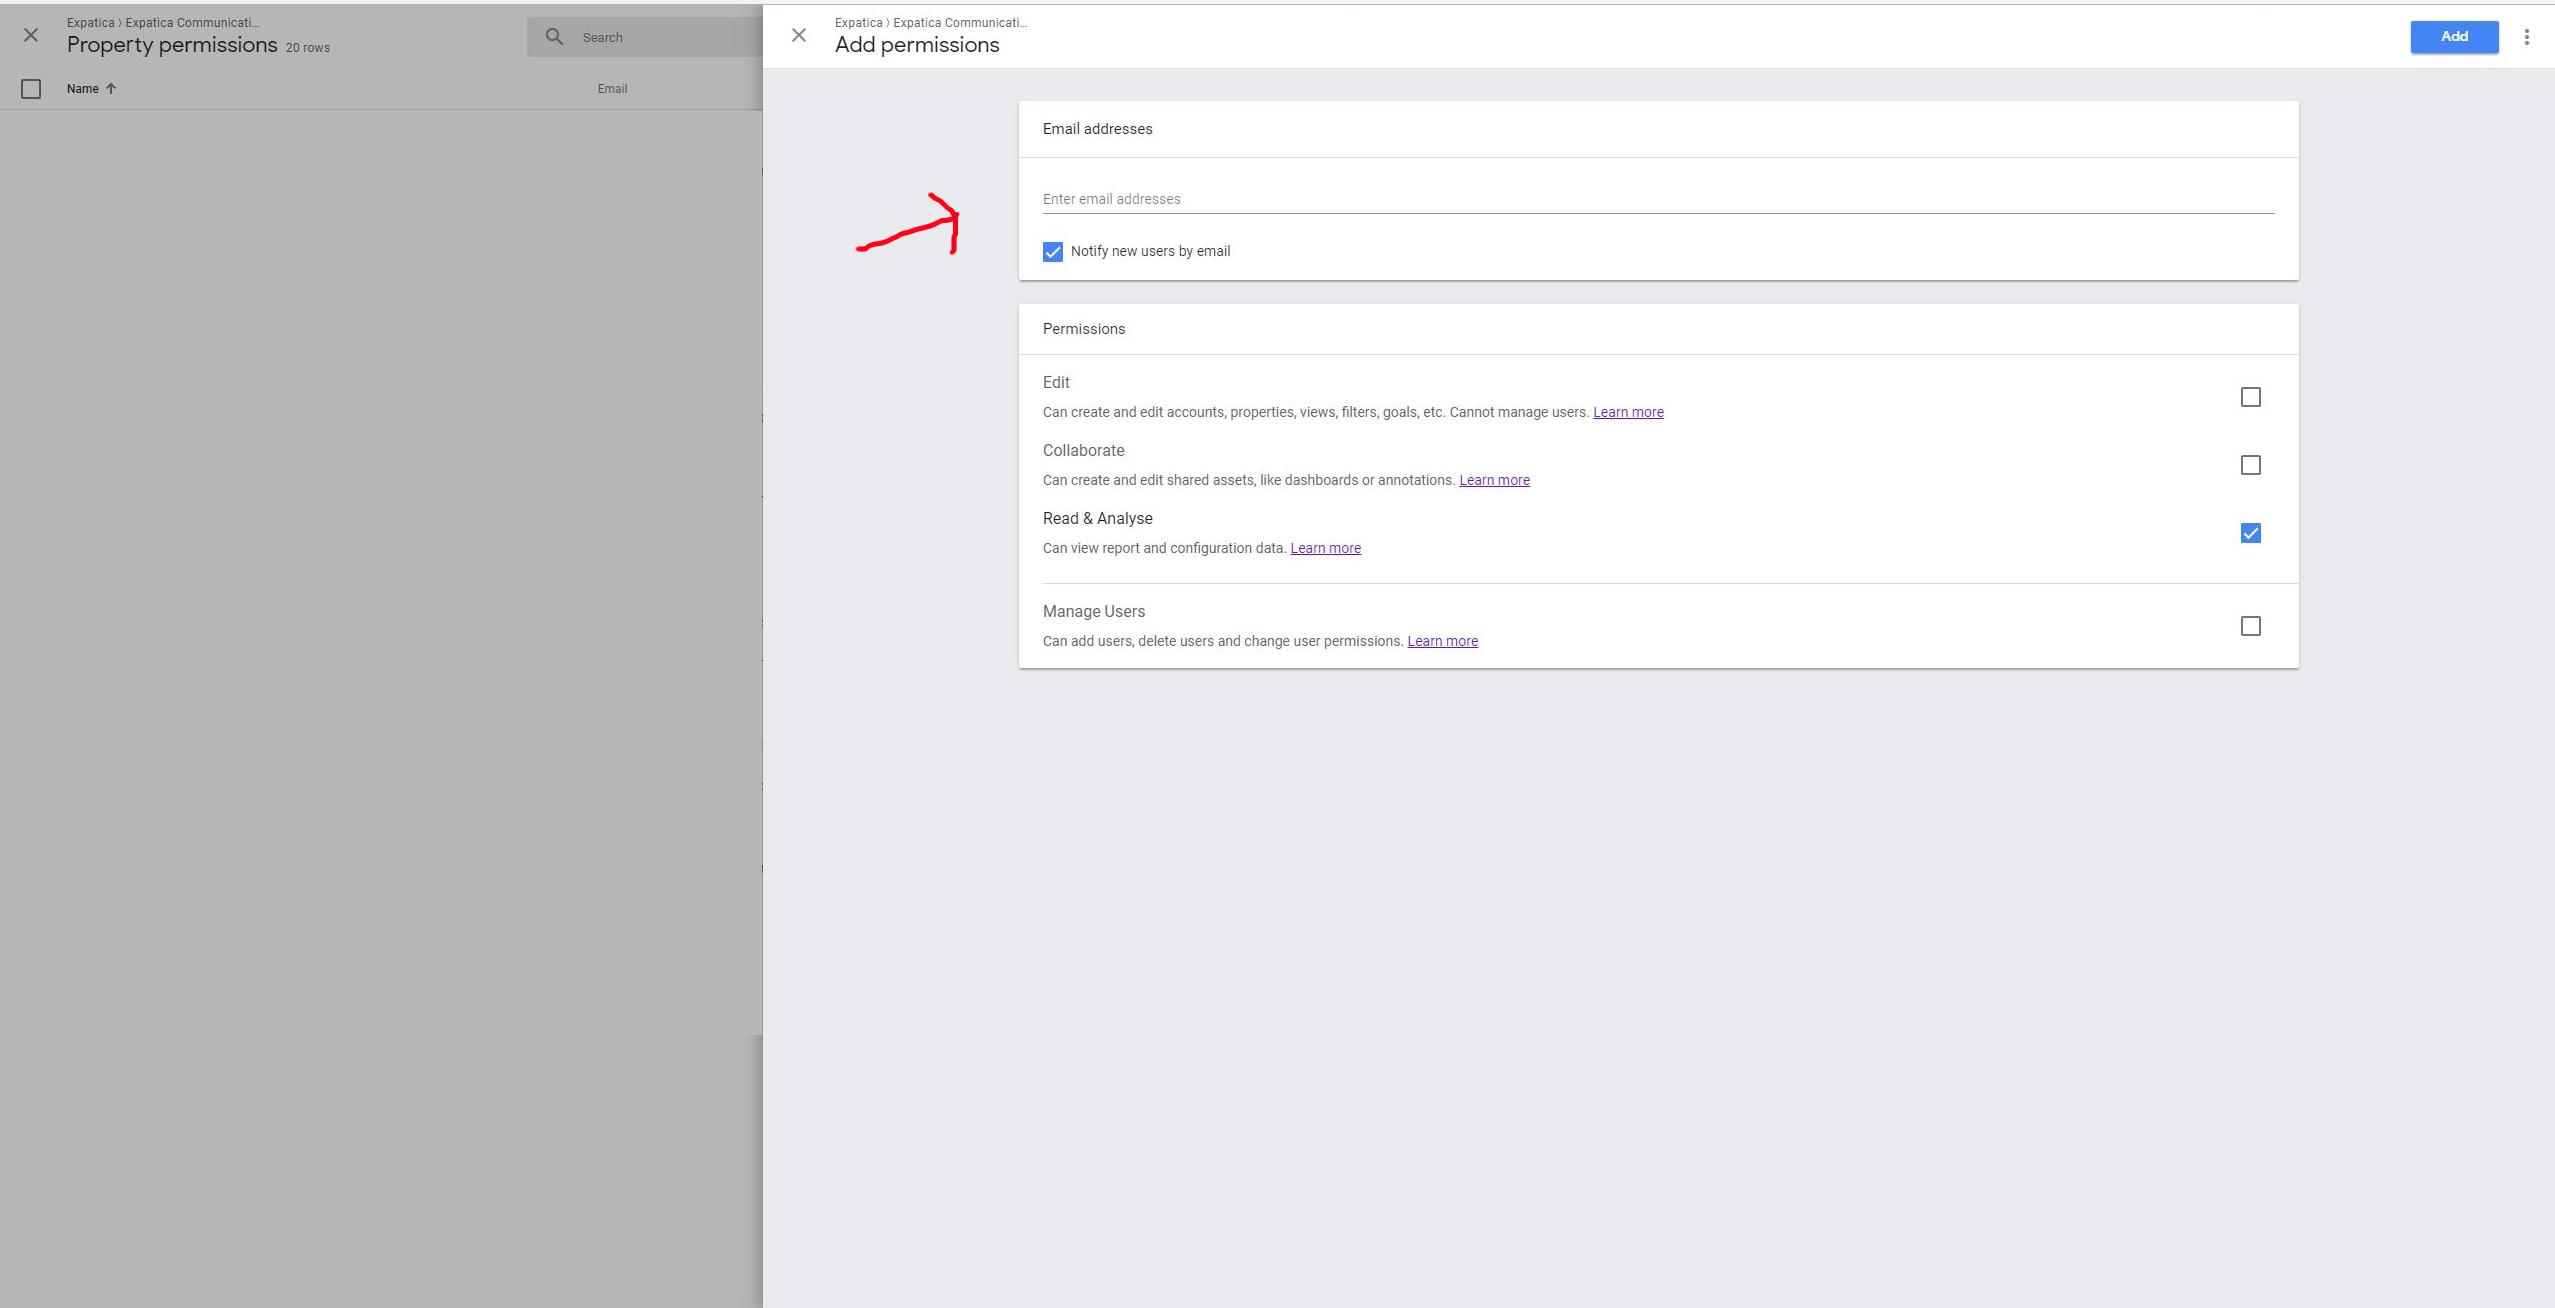 access Google Analytics step 5